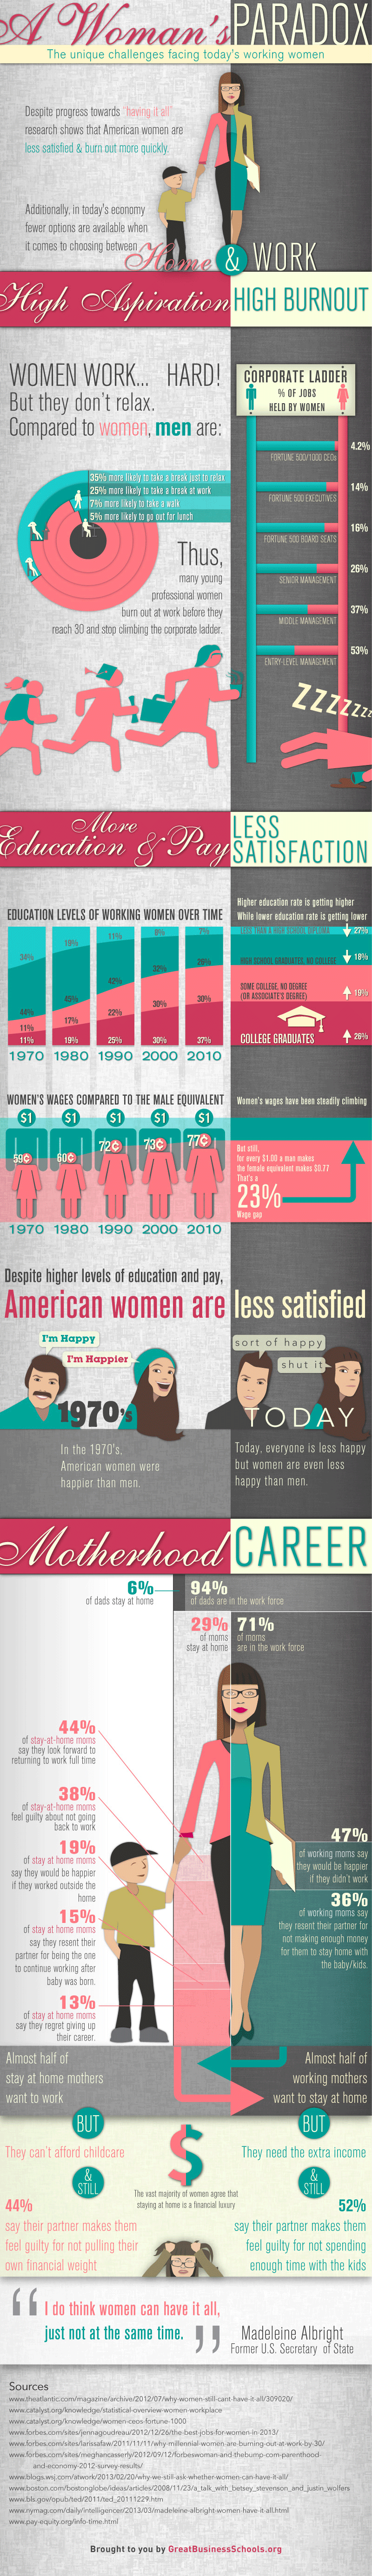 The Unique Challgenge Facing Working Women